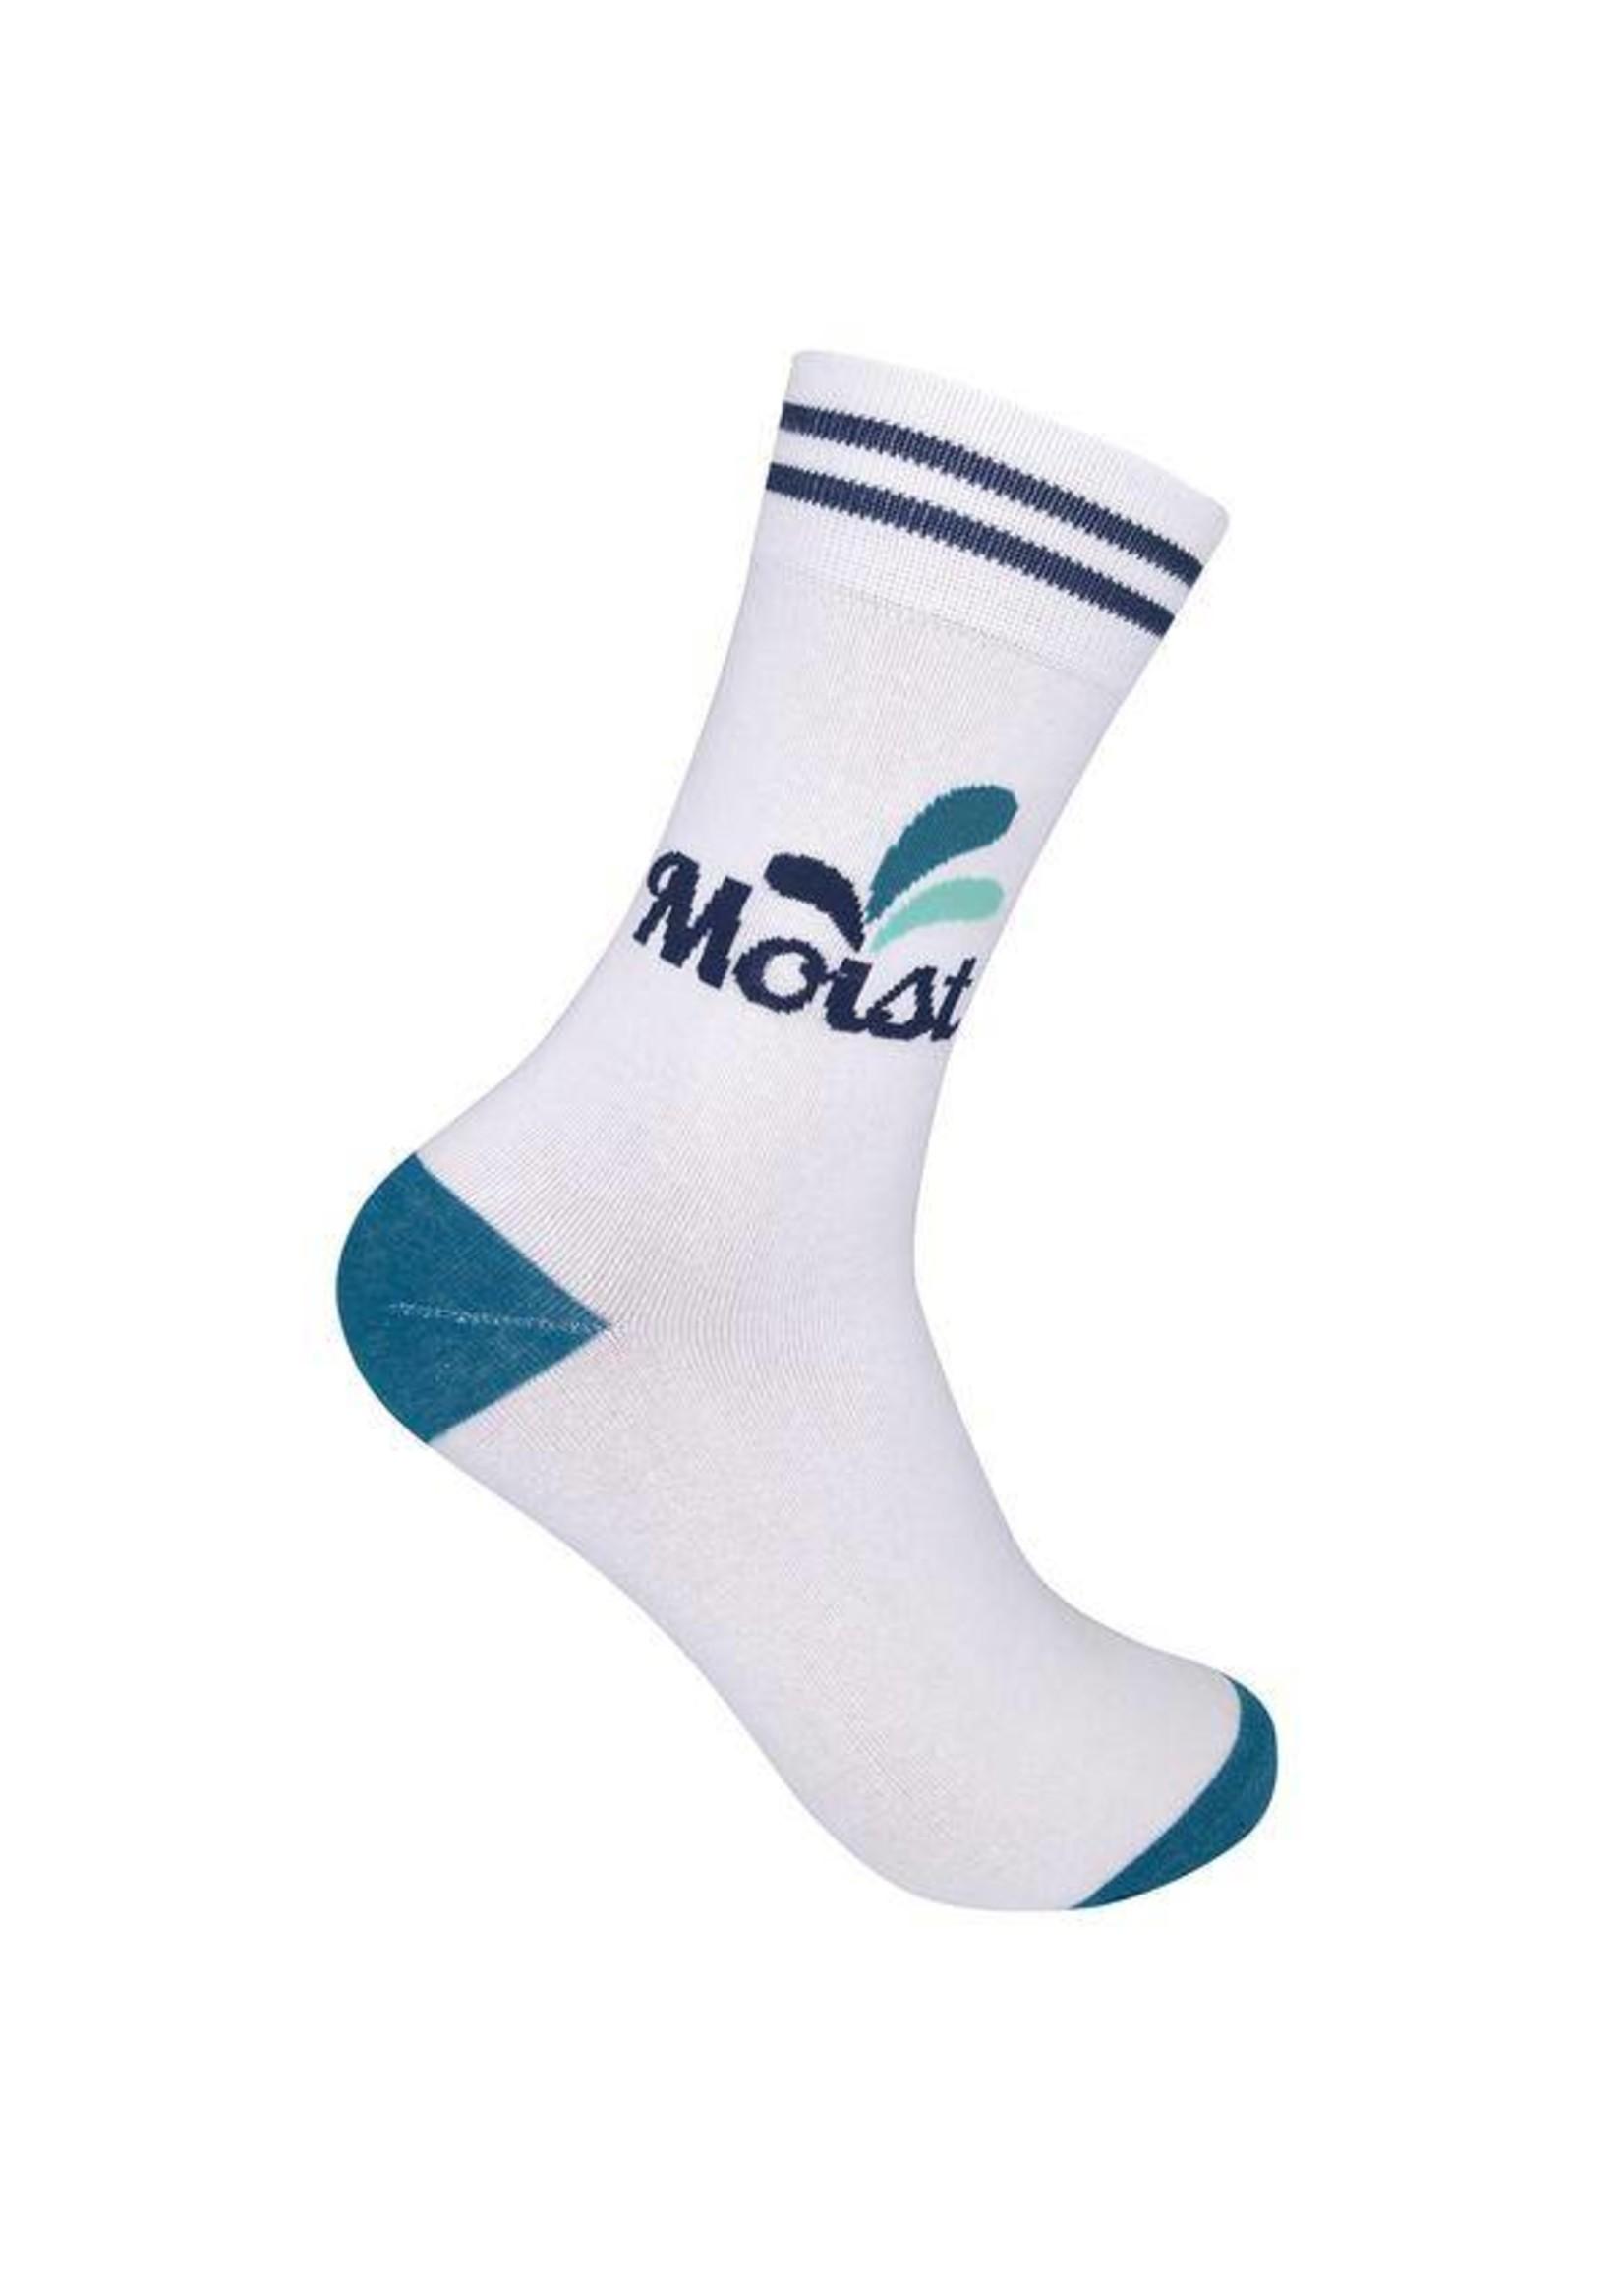 Funatic Moist Socks